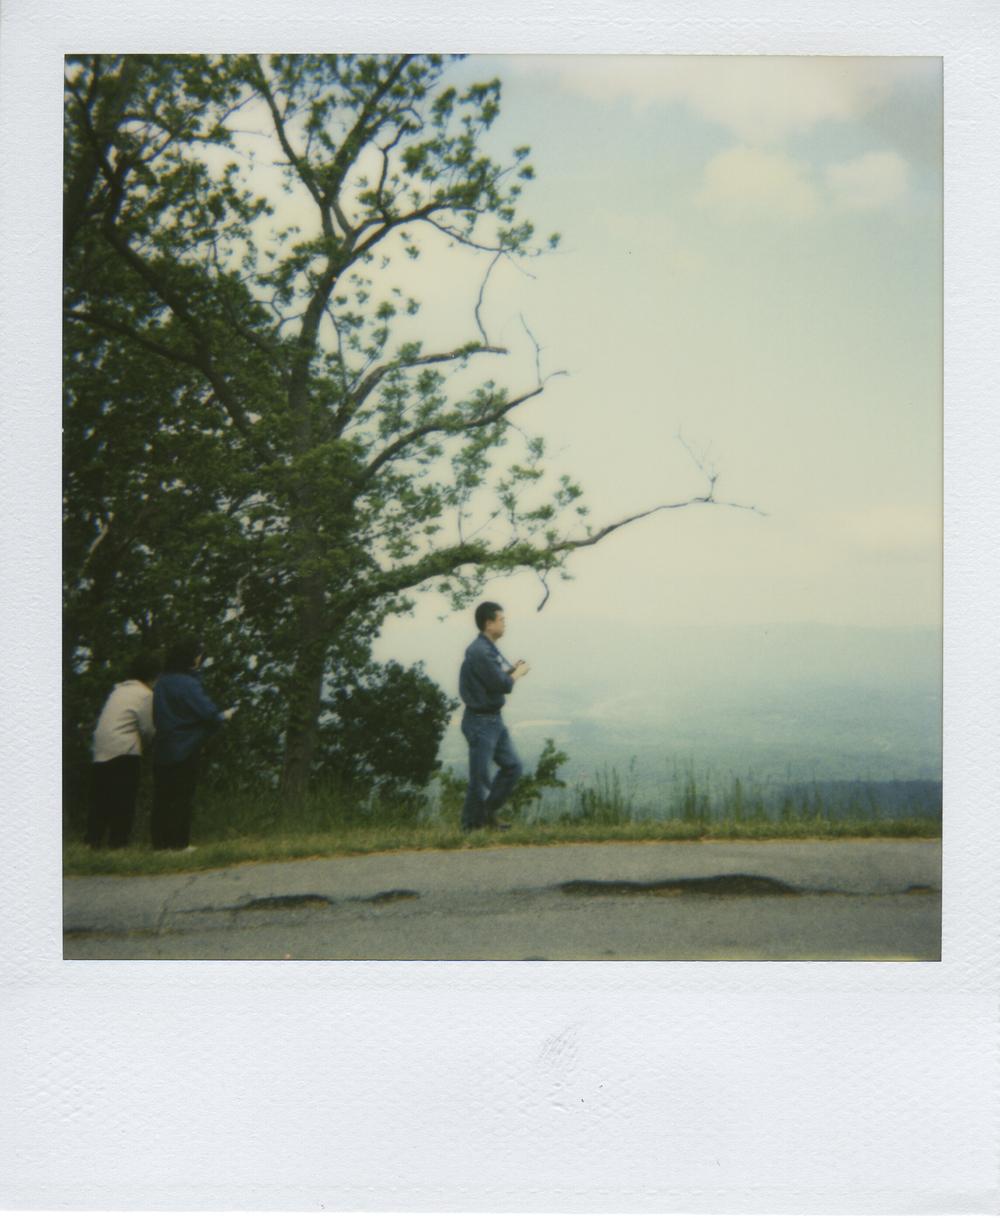 jlaurence-polaroid-092.jpg